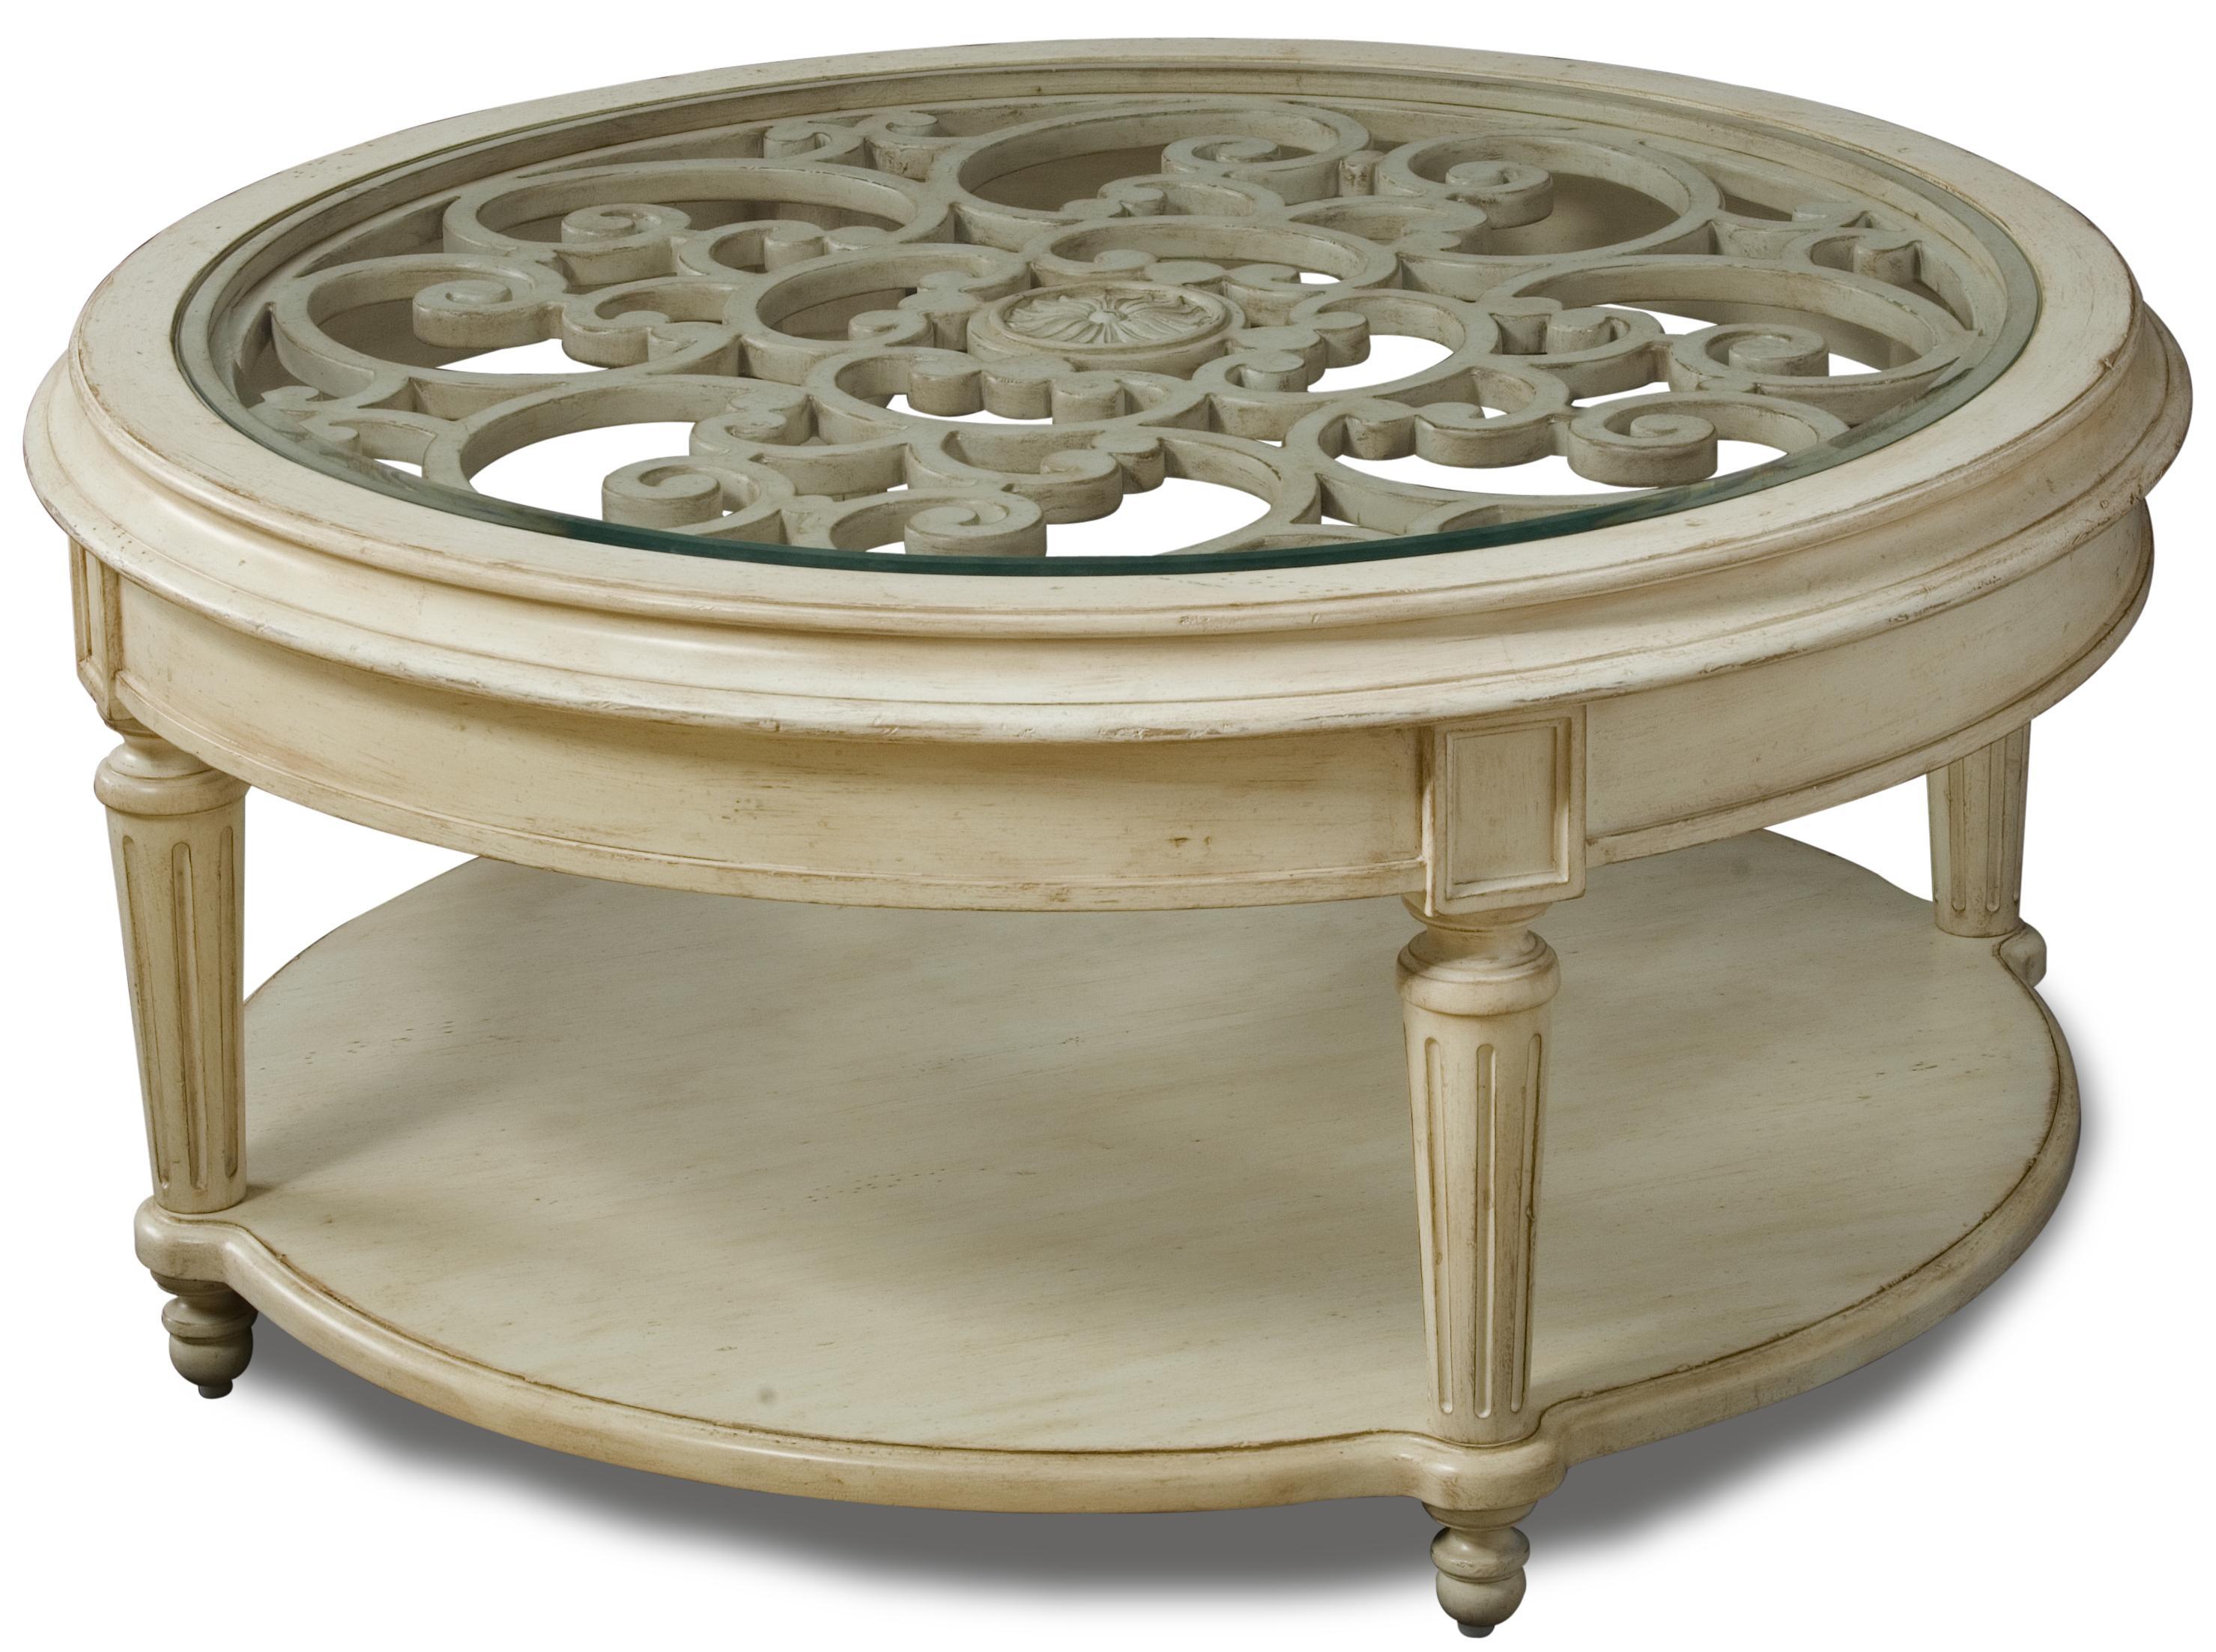 Ordinaire A.R.T. Furniture Inc ProvenanceRound Cocktail Table ...